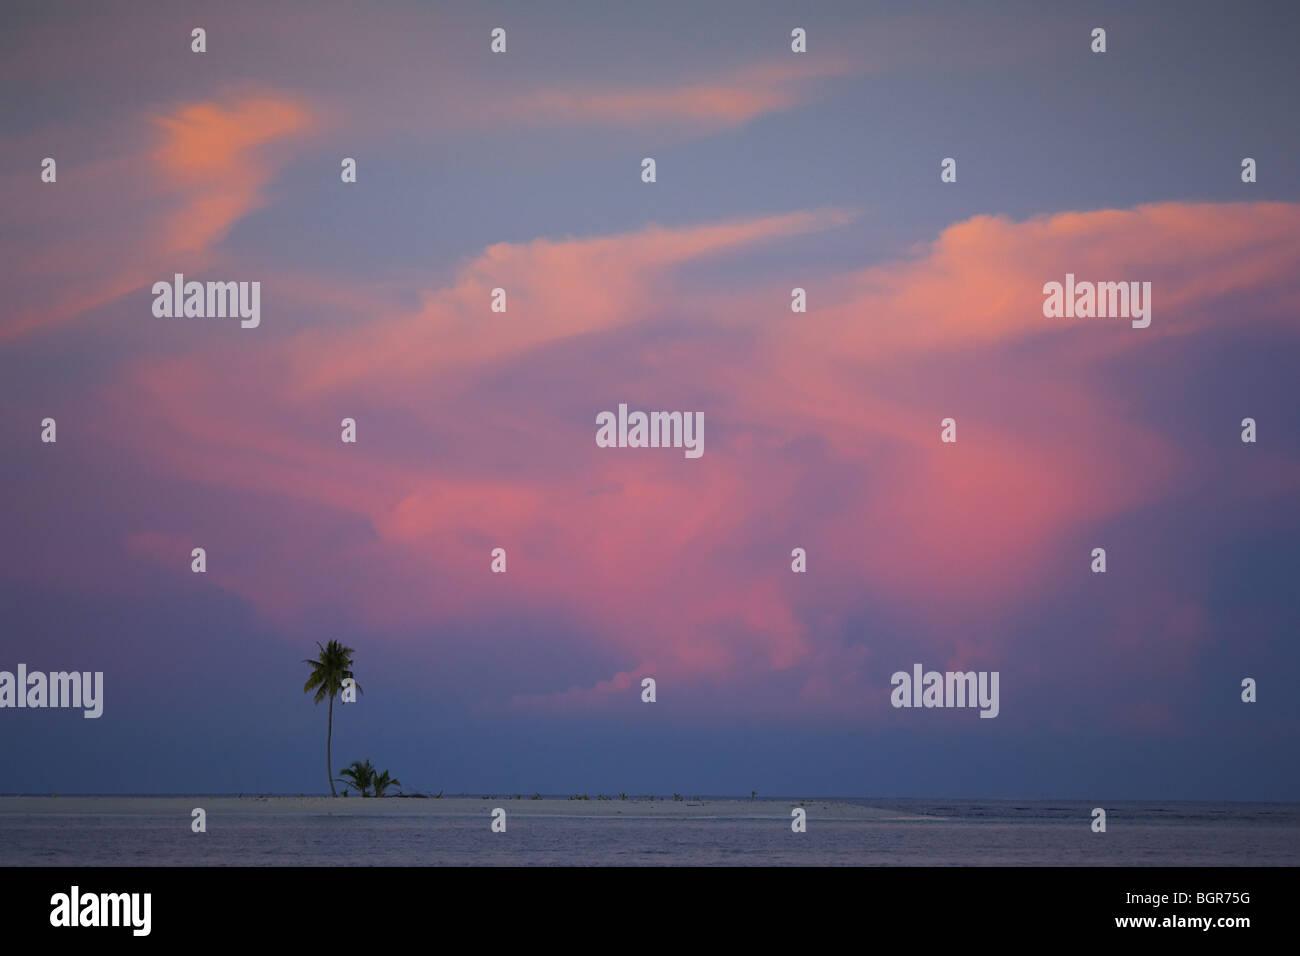 Sunset over sand island - Stock Image